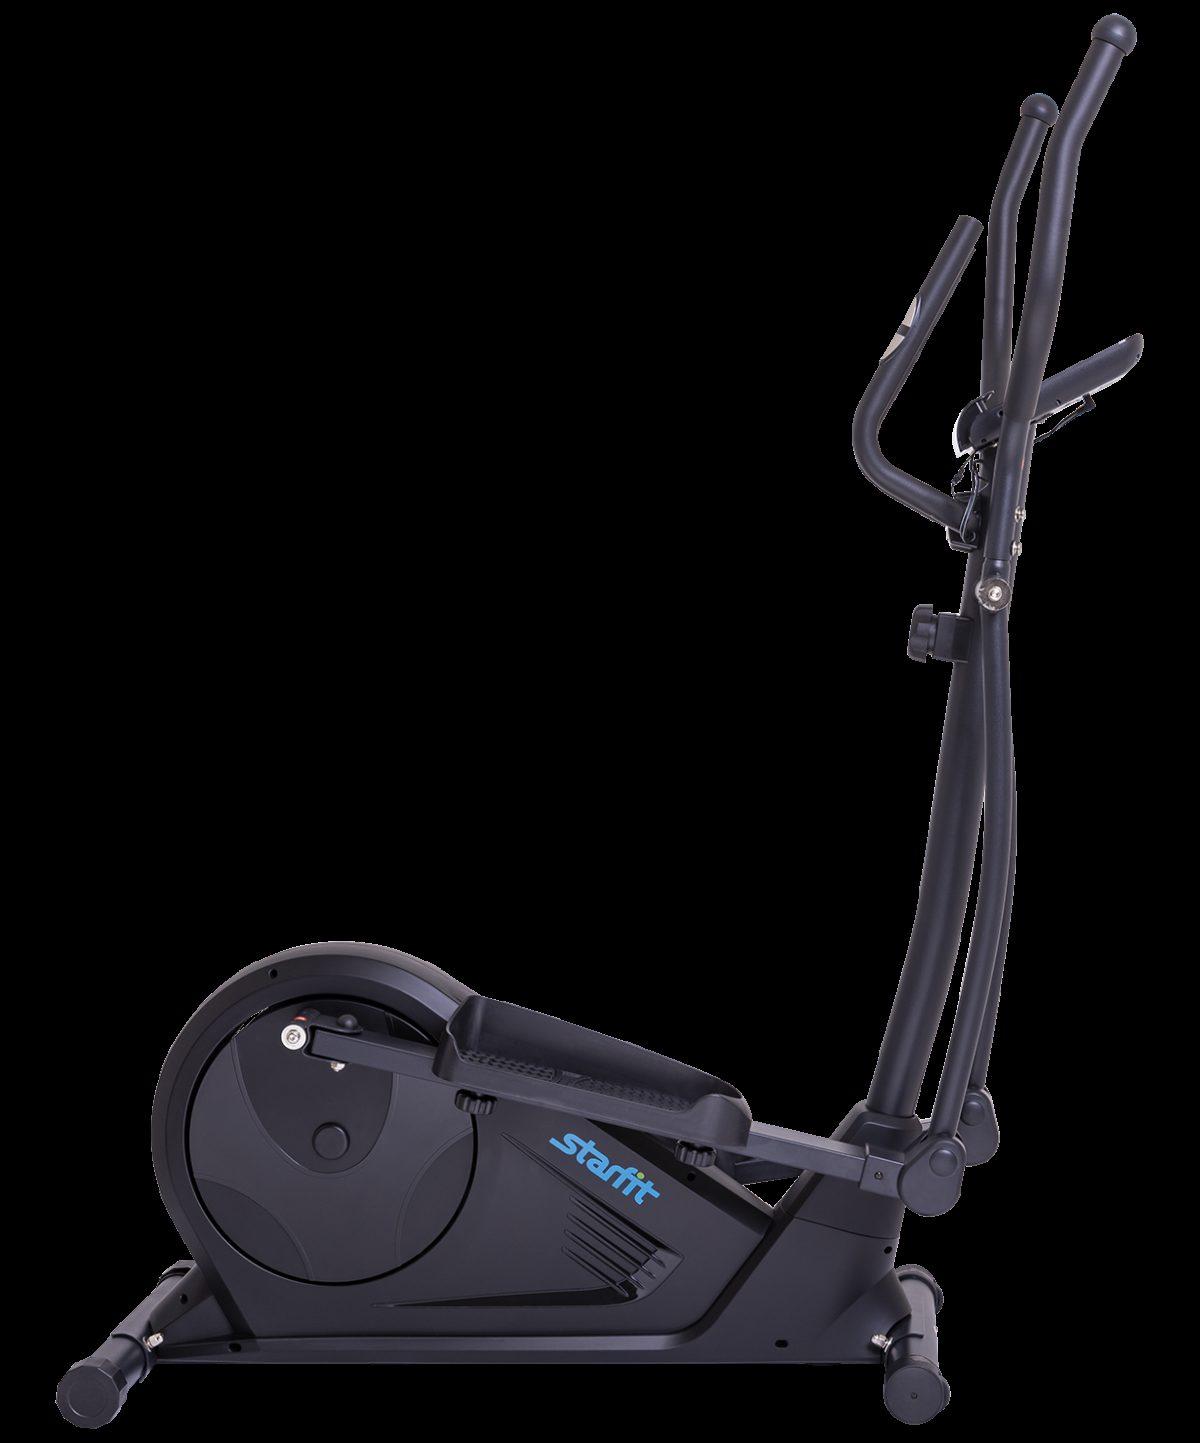 STARFIT Carrera New Эллиптический тренажер магнитный  VE-105 - 3